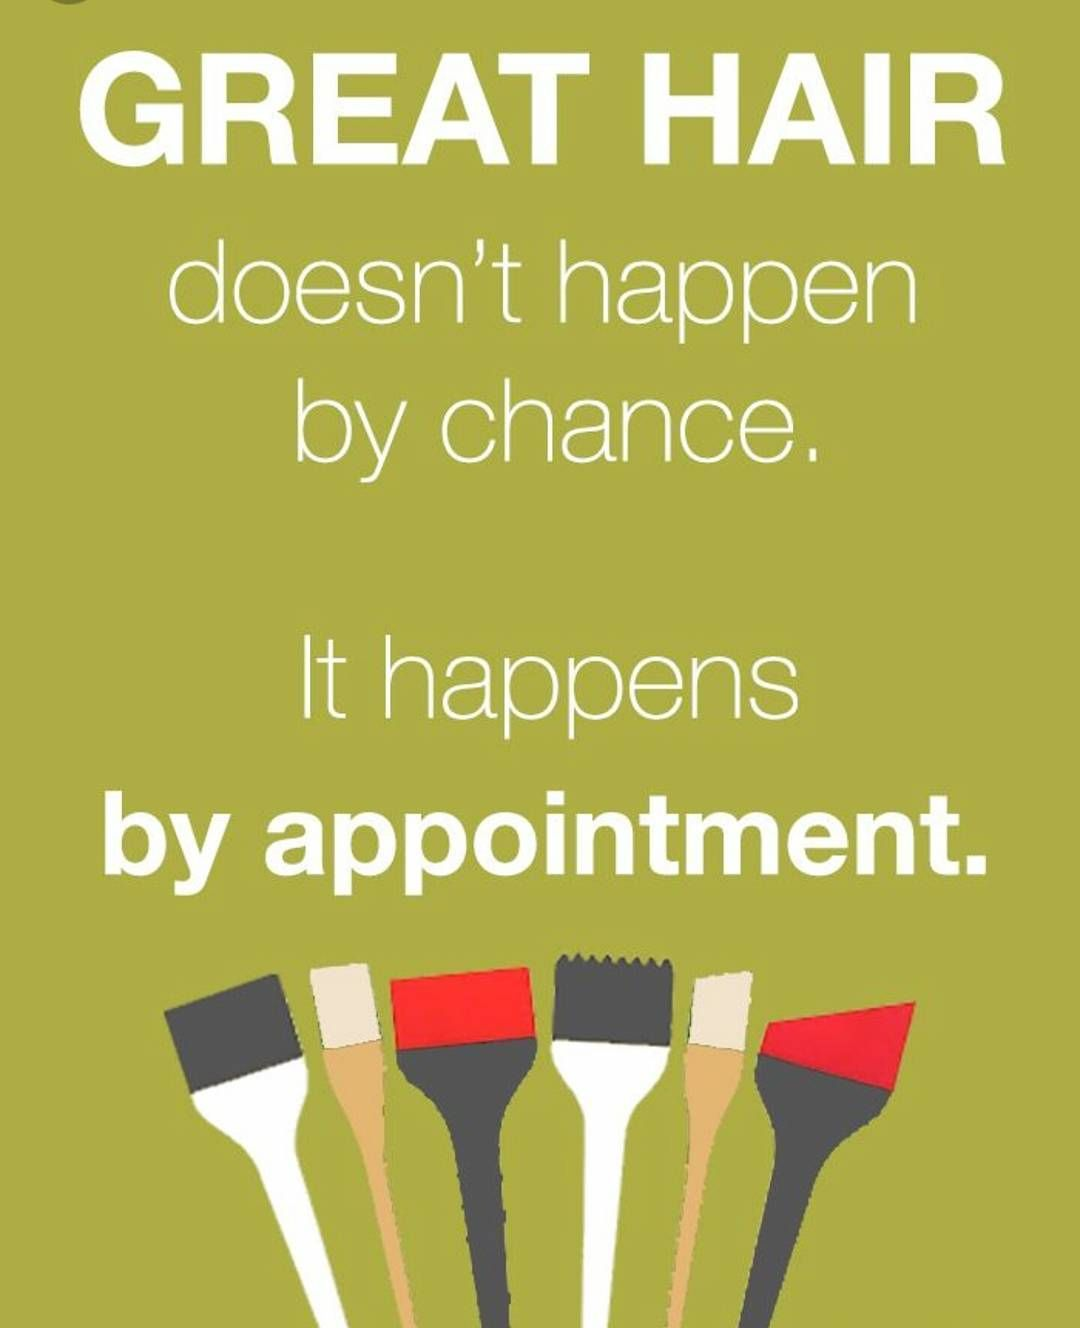 Instagram Photo By Stefanie Jun 23 2016 At 11 32pm Utc Stylist Quotes Hairstylist Quotes Hair Quotes